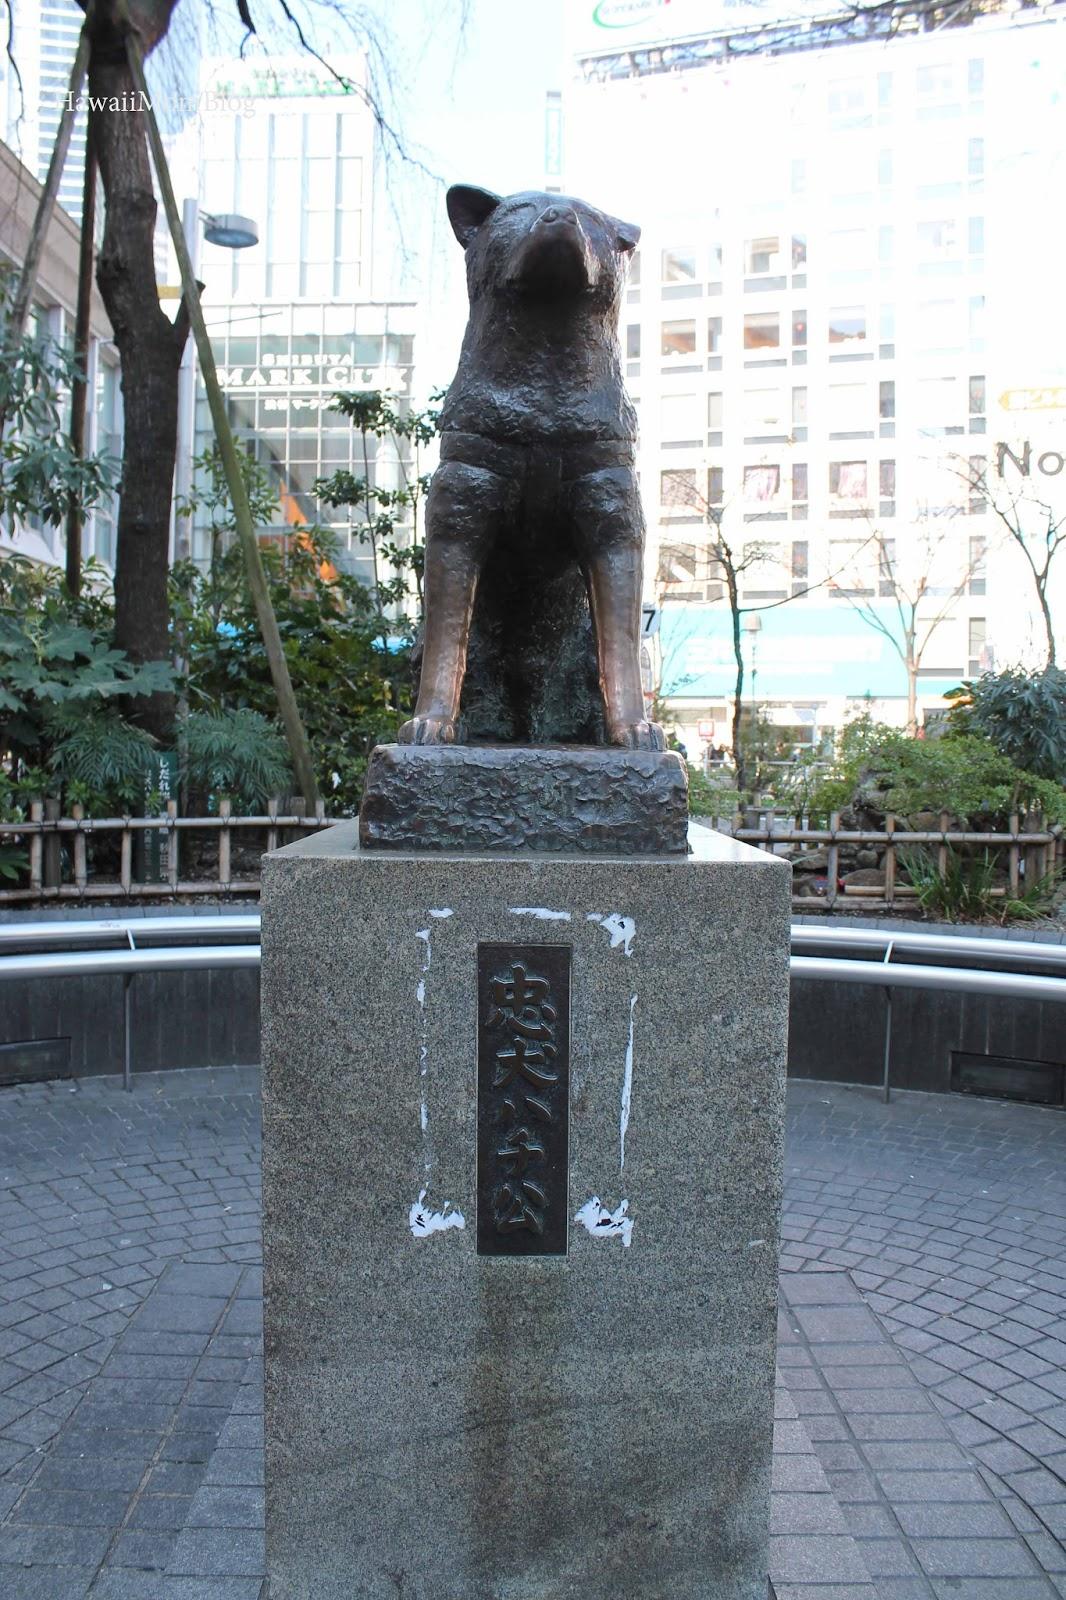 Hawaii Mom Blog: Visit Tokyo: Hachiko Statue